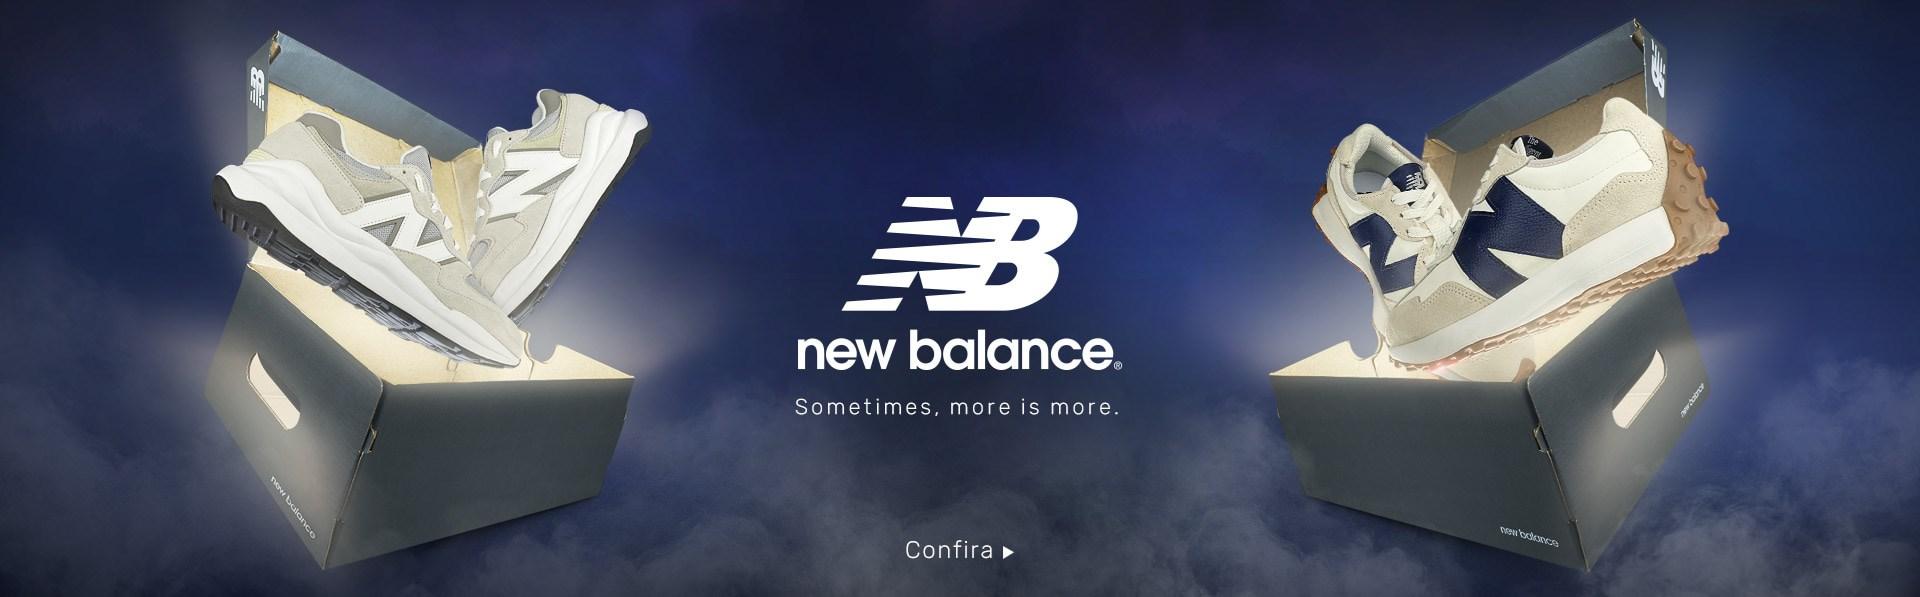 new balance lançamentos